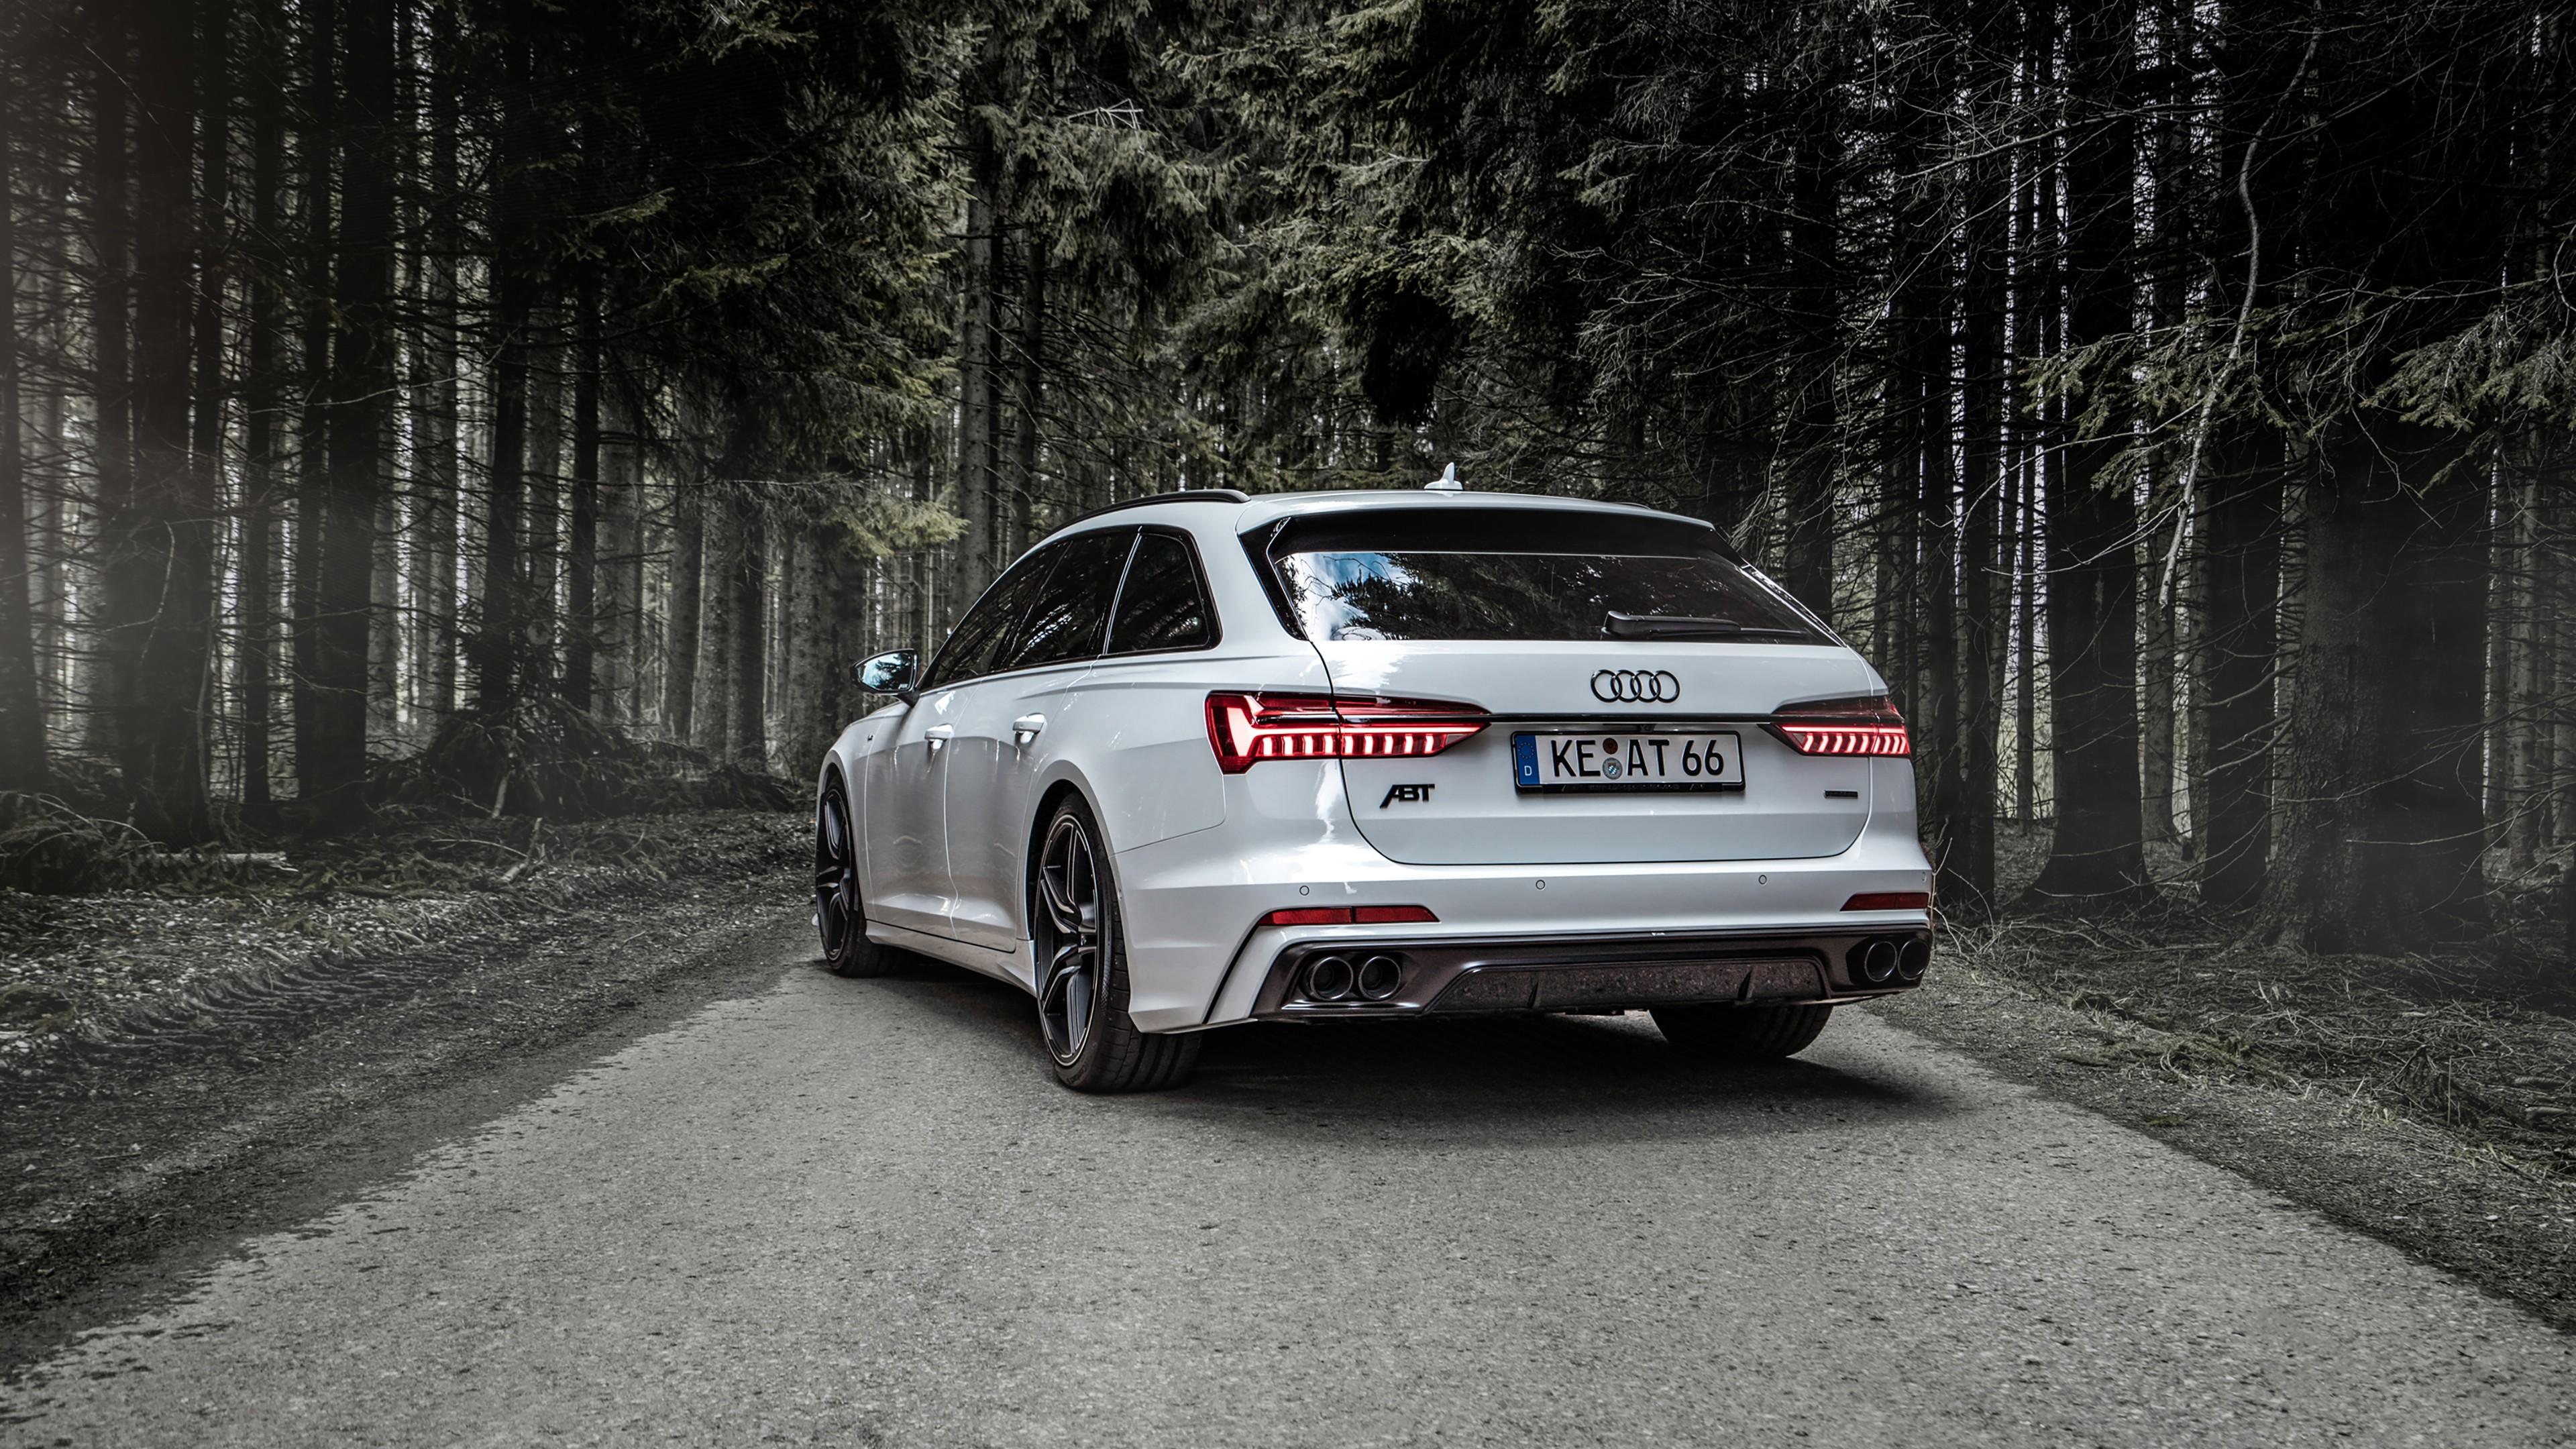 Abt Audi A6 3 0 Tdi Avant 2019 4k 2 Wallpaper Hd Car Wallpapers Id 13333